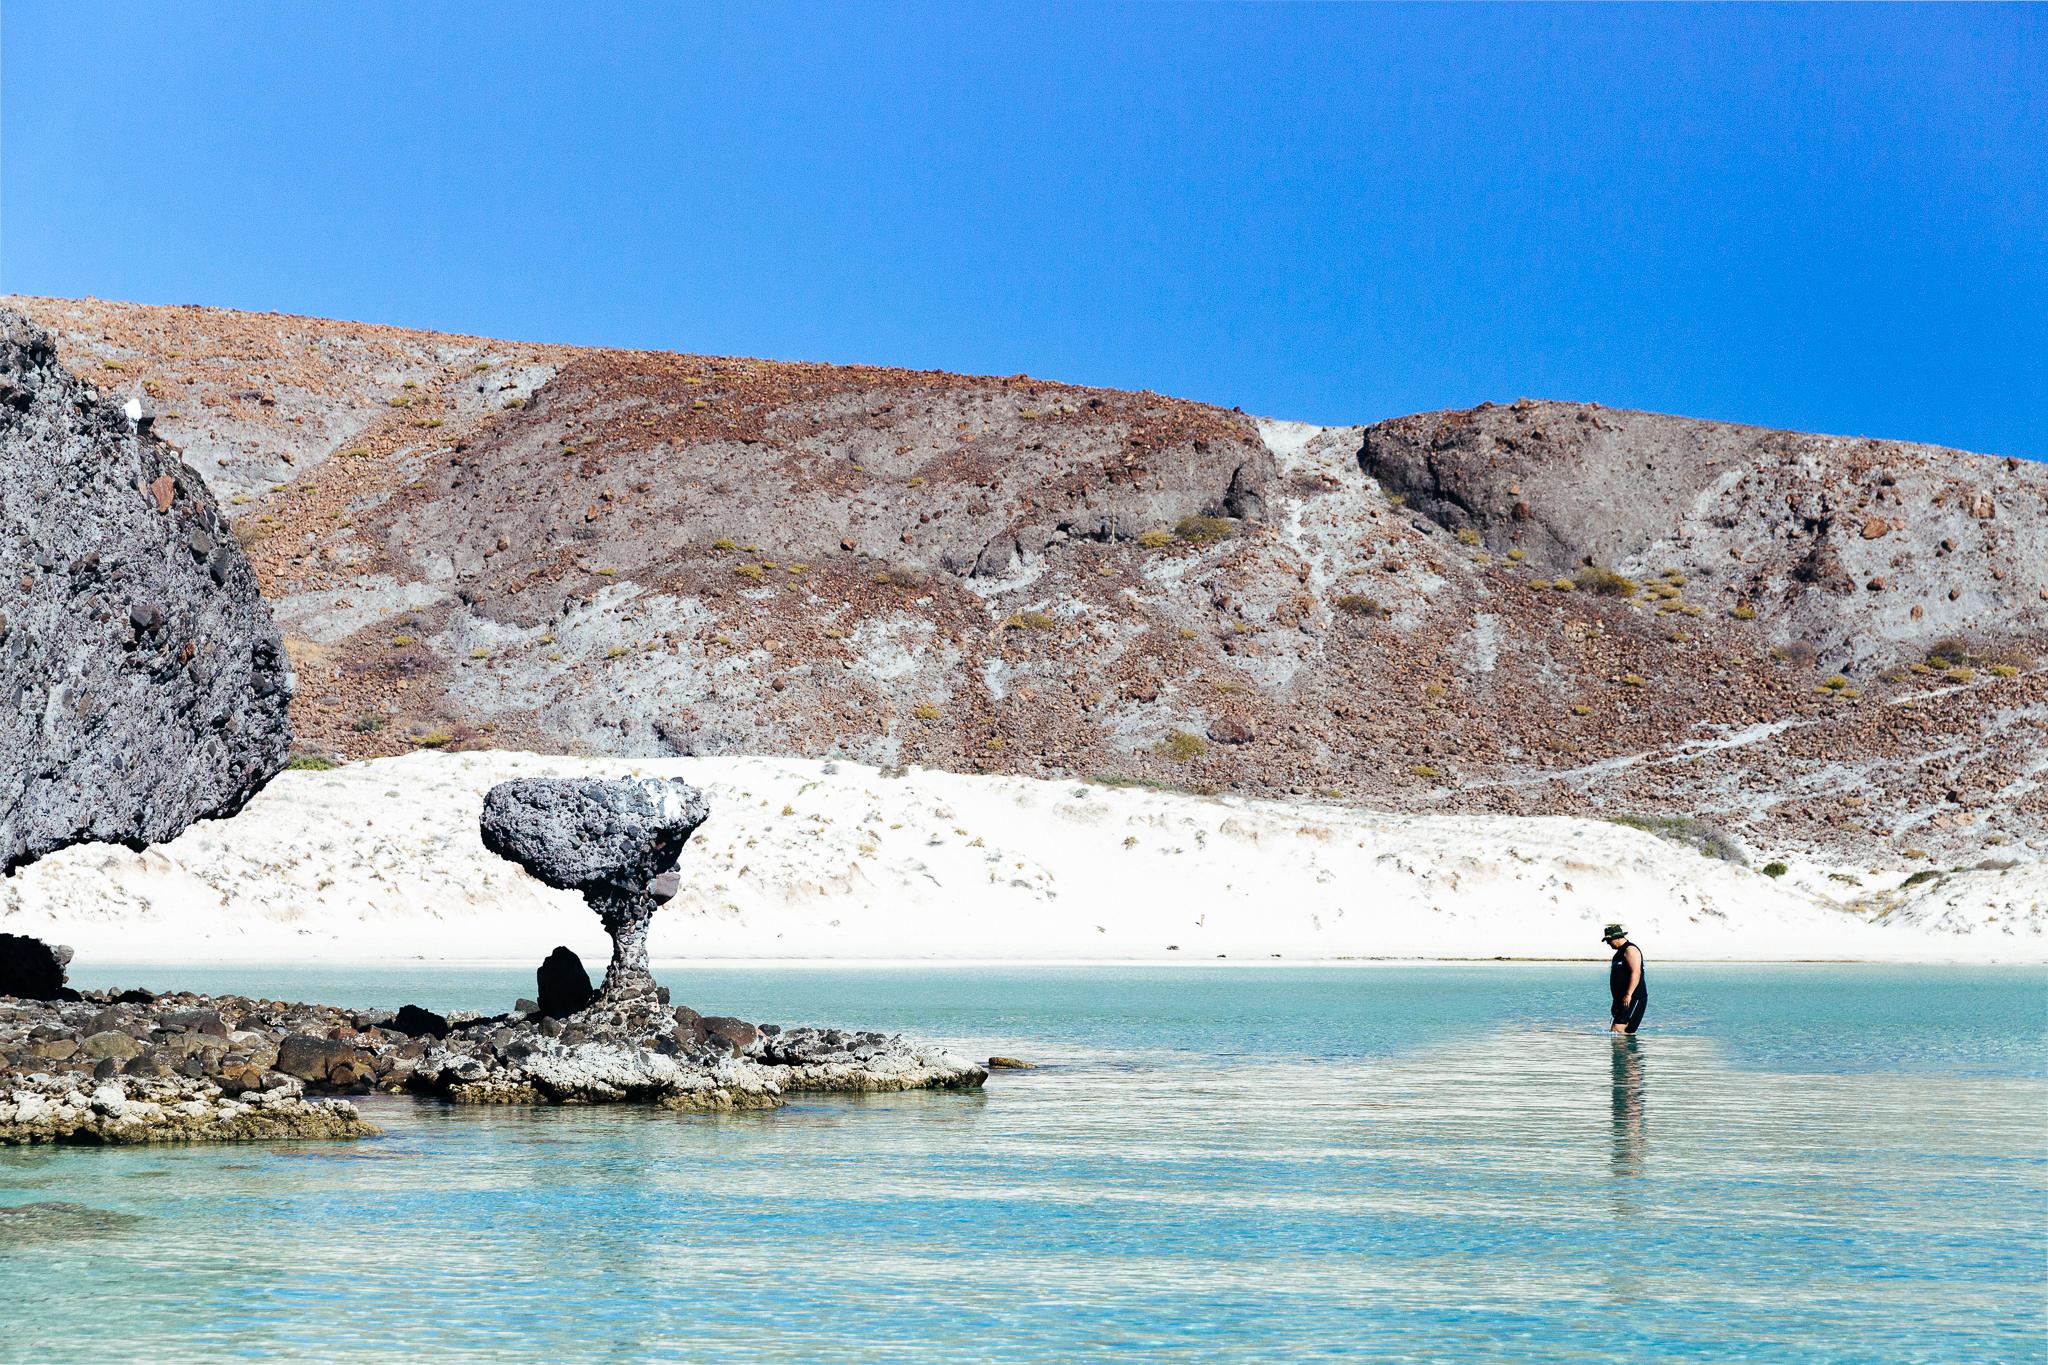 Helynn_Ospina_Travel_Mexico_Baja_Todos_Santos_2324019.jpg